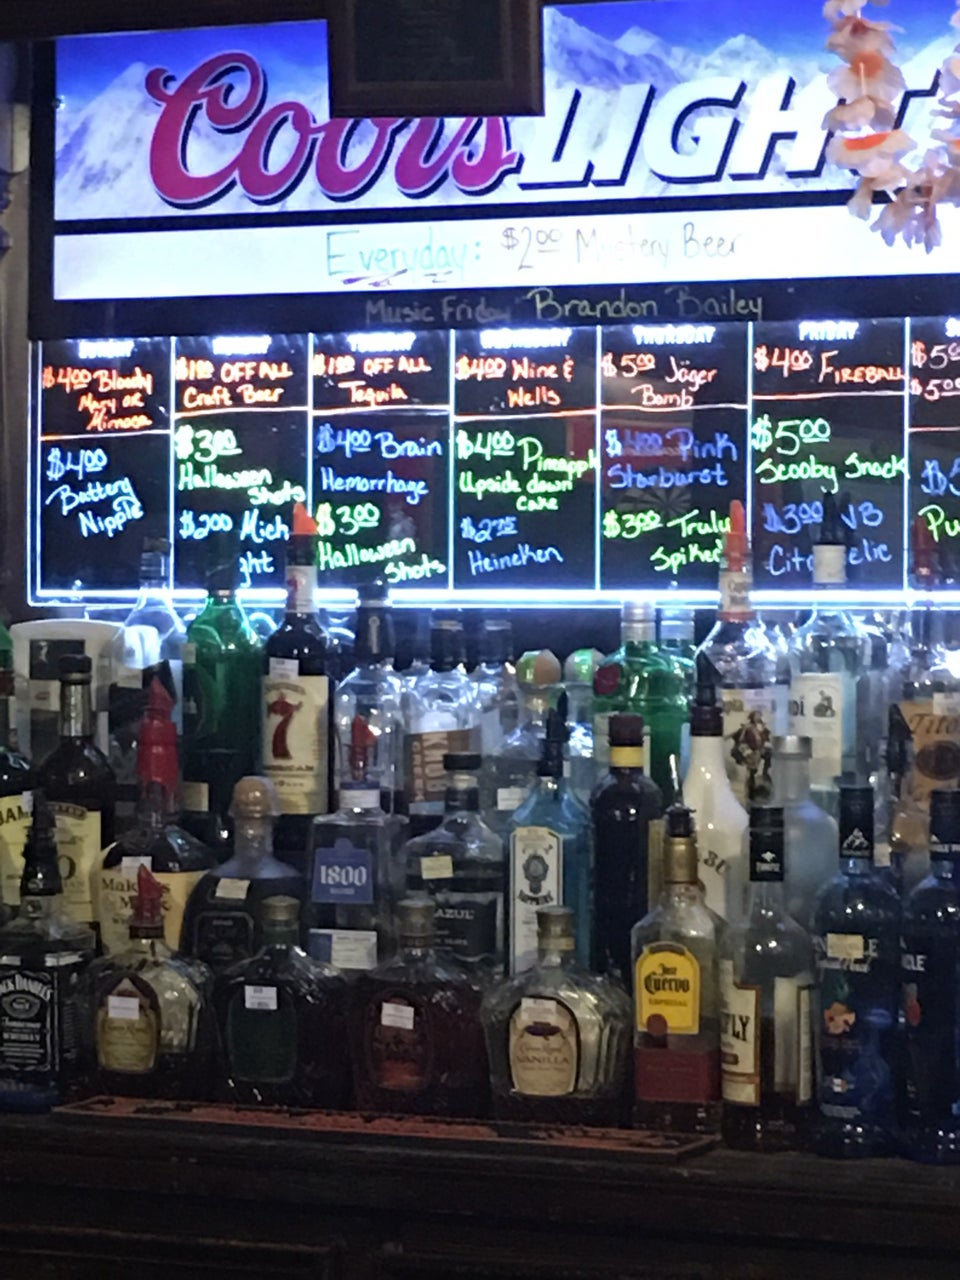 Tavern in The grove 25 b, 25 Old Drug Store Rd, Garner